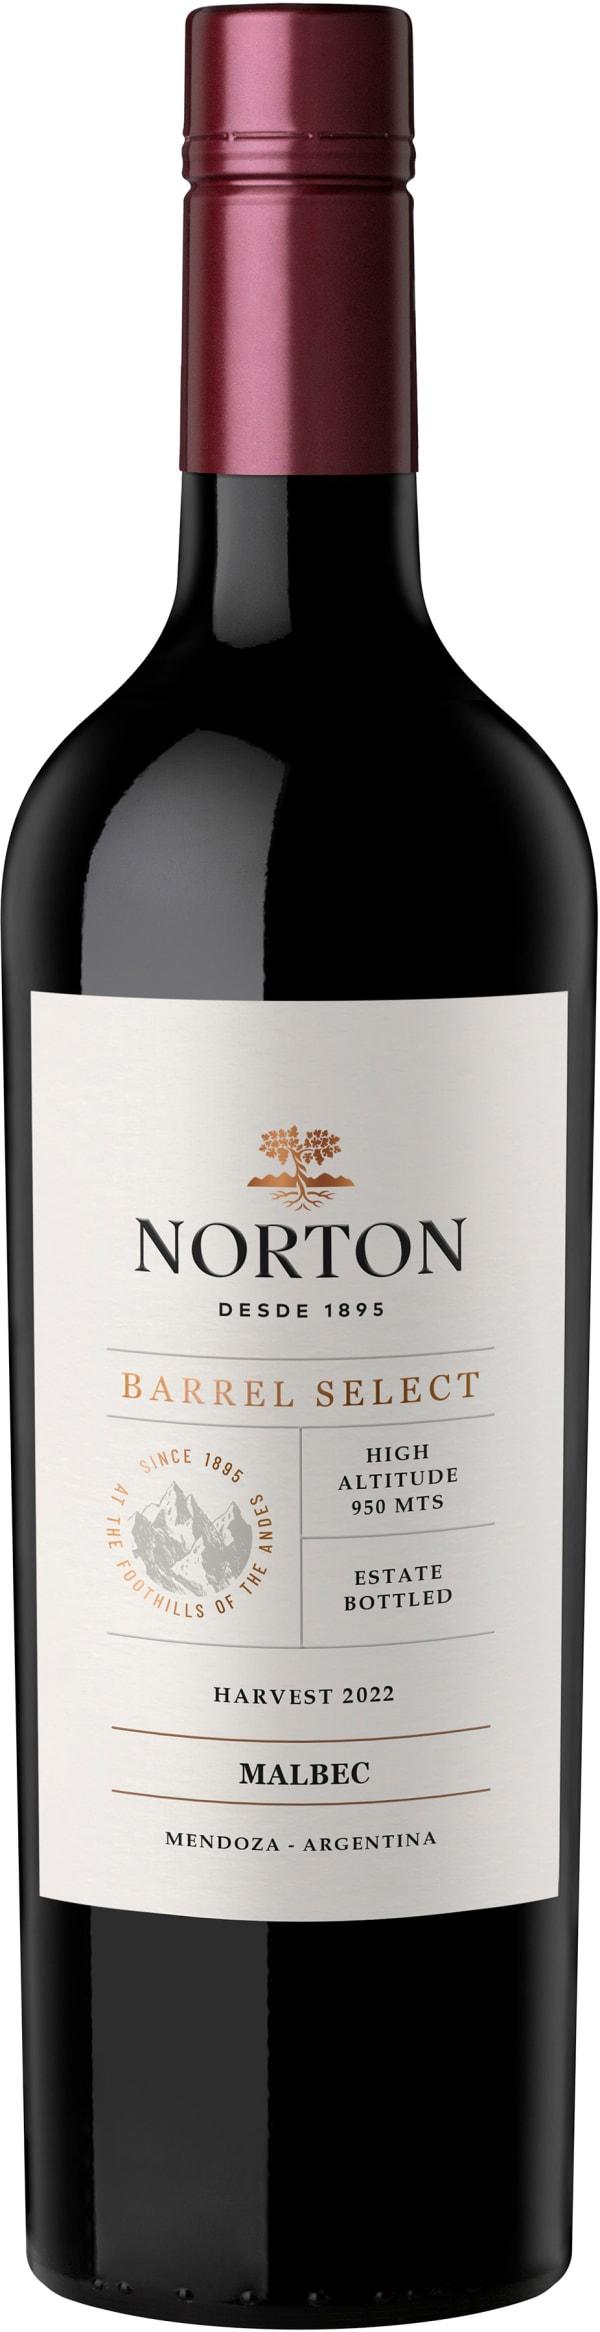 Norton Barrel Select Malbec 2018